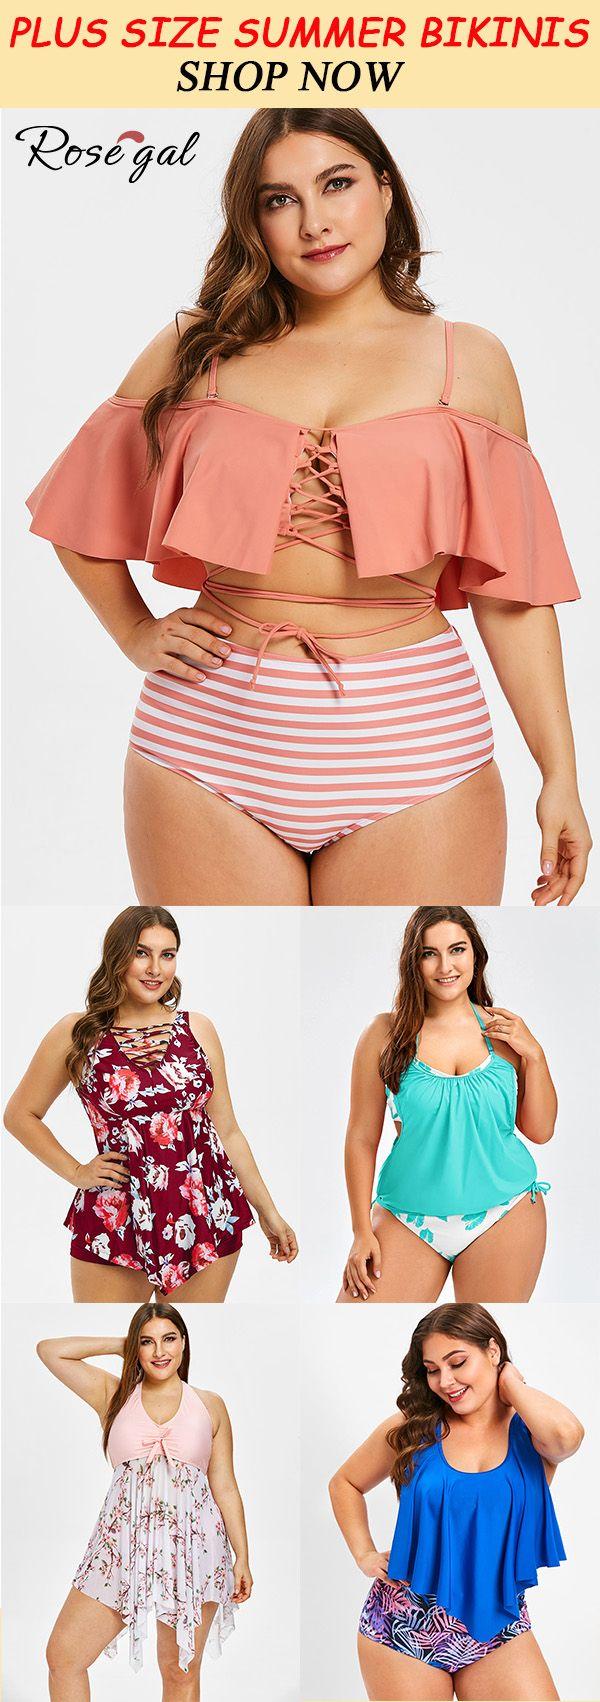 Plus Size Swimsuit tankini for summer vacation #Rosegal #bikini – Swimsuit